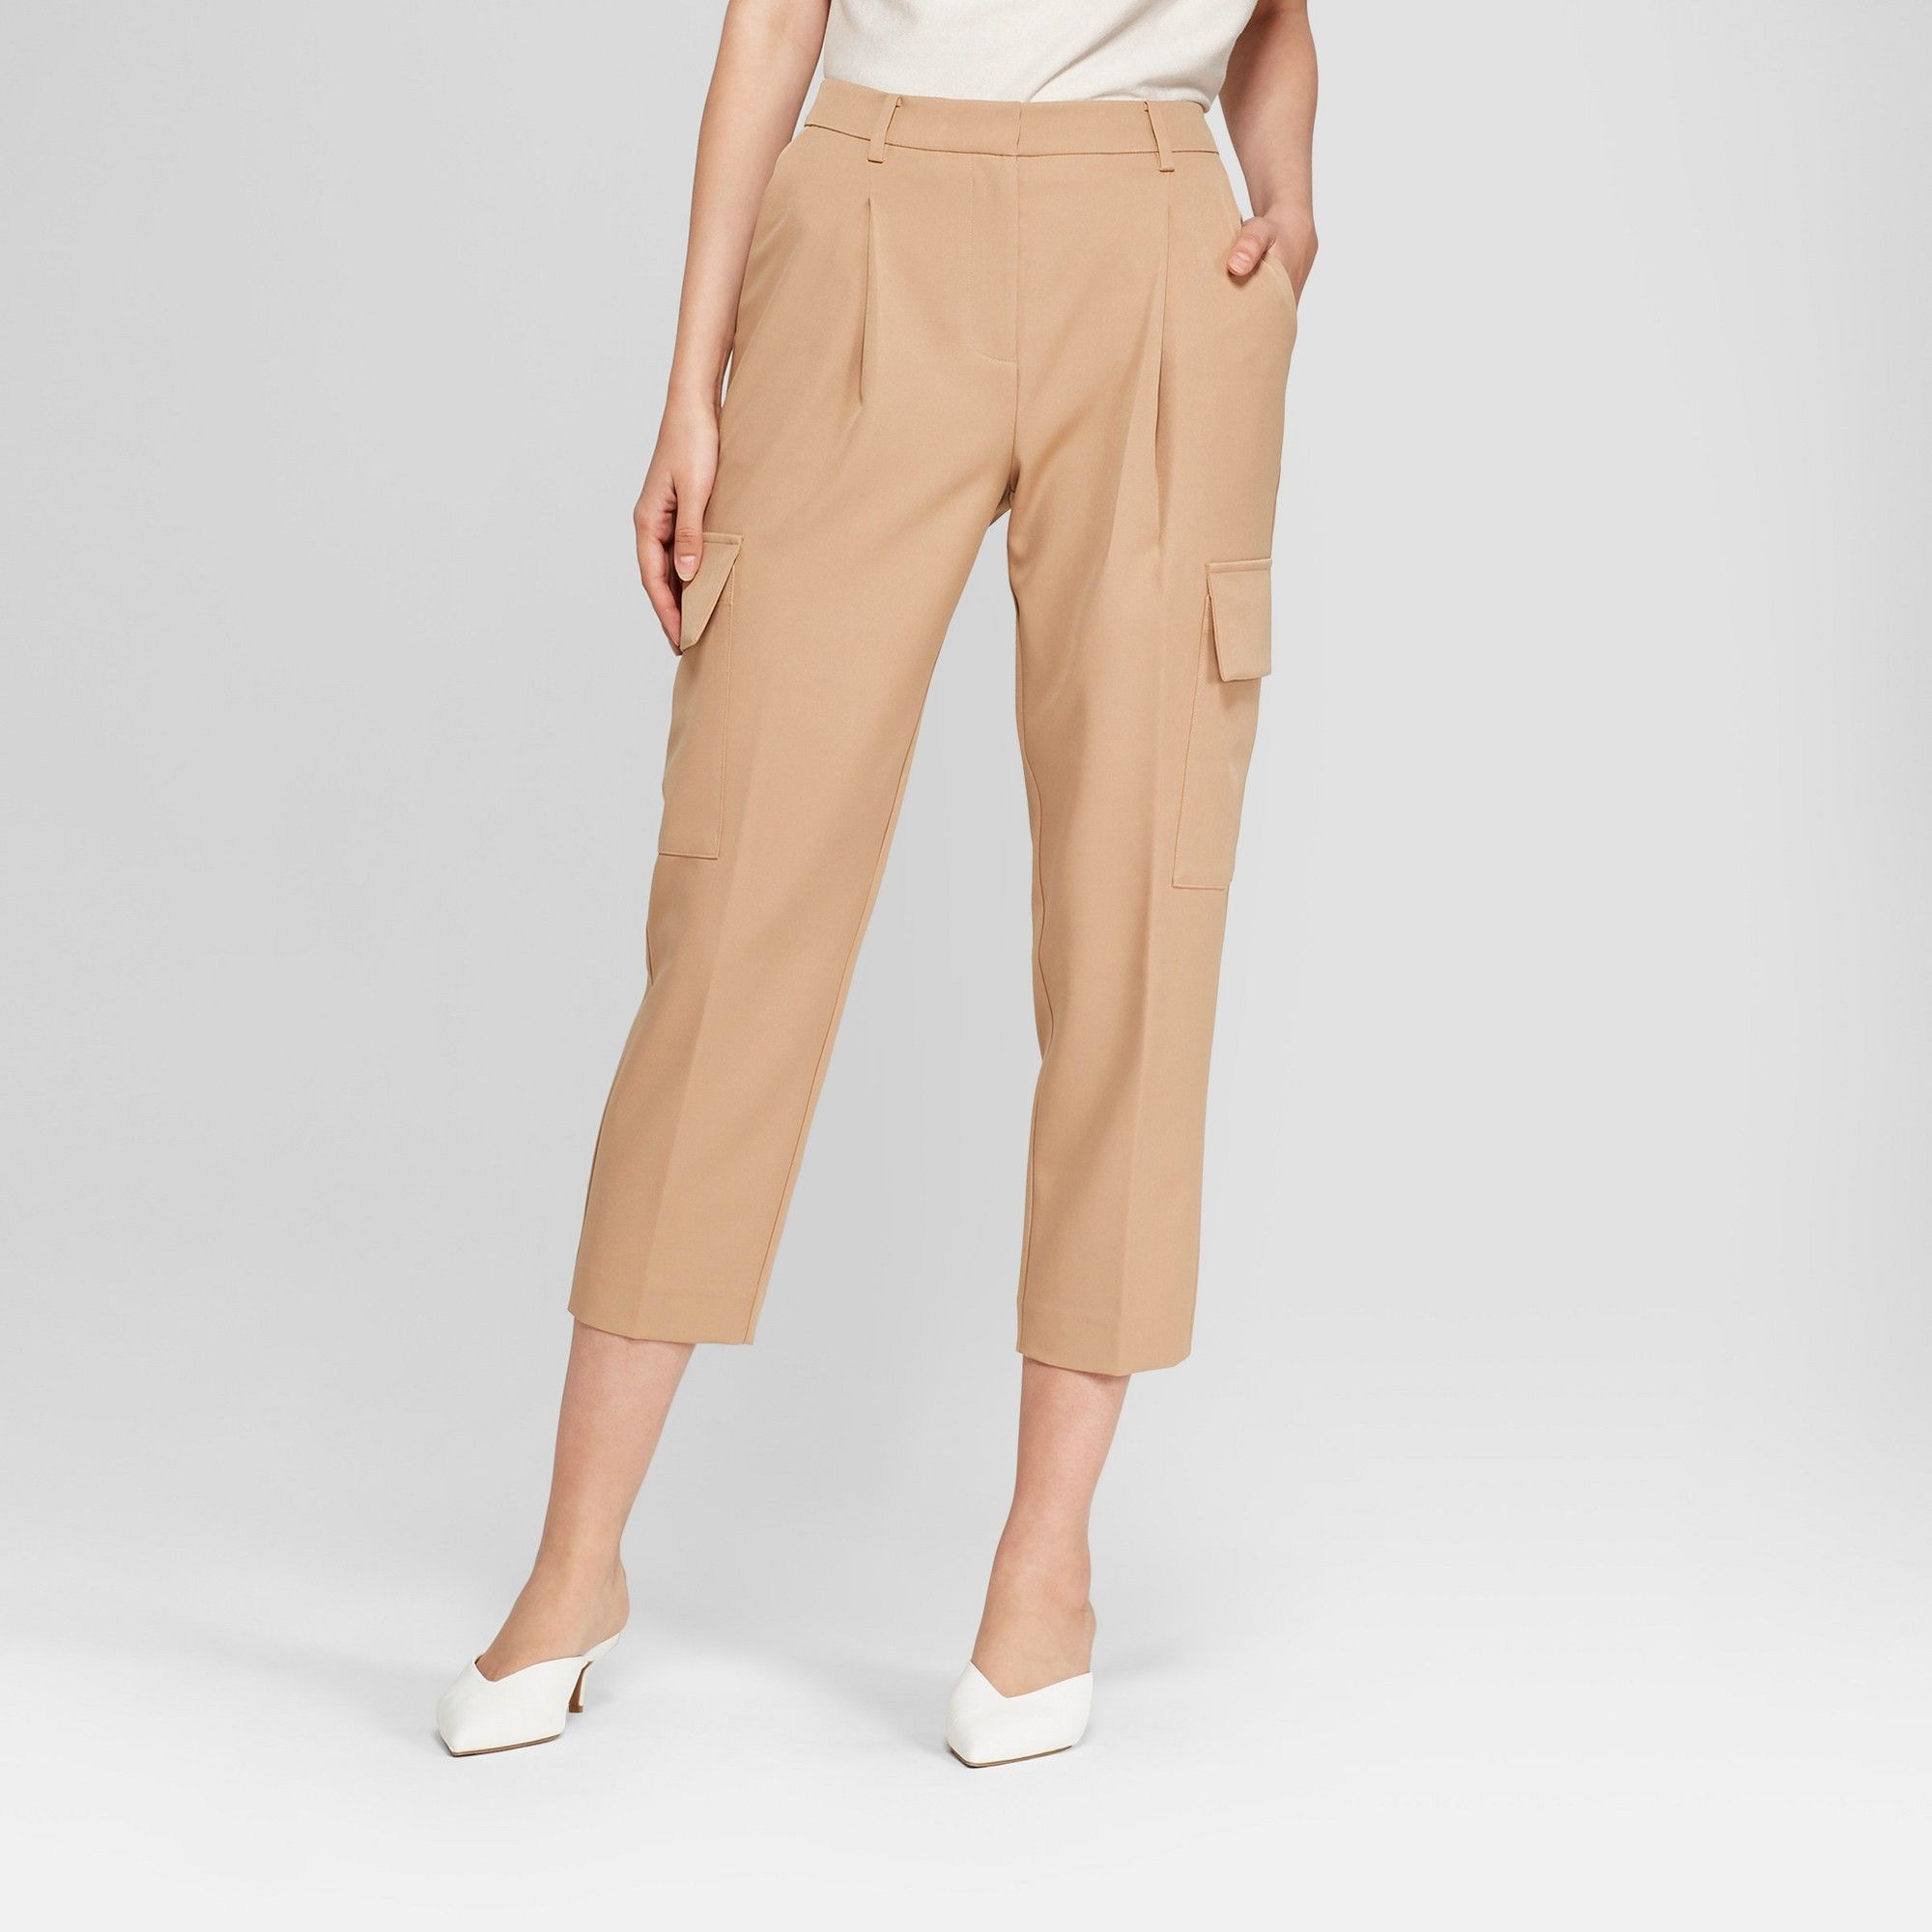 de010d555c Women's Straight Leg Cropped Cargo Pants - Prologue Khaki (Green) 14 ...